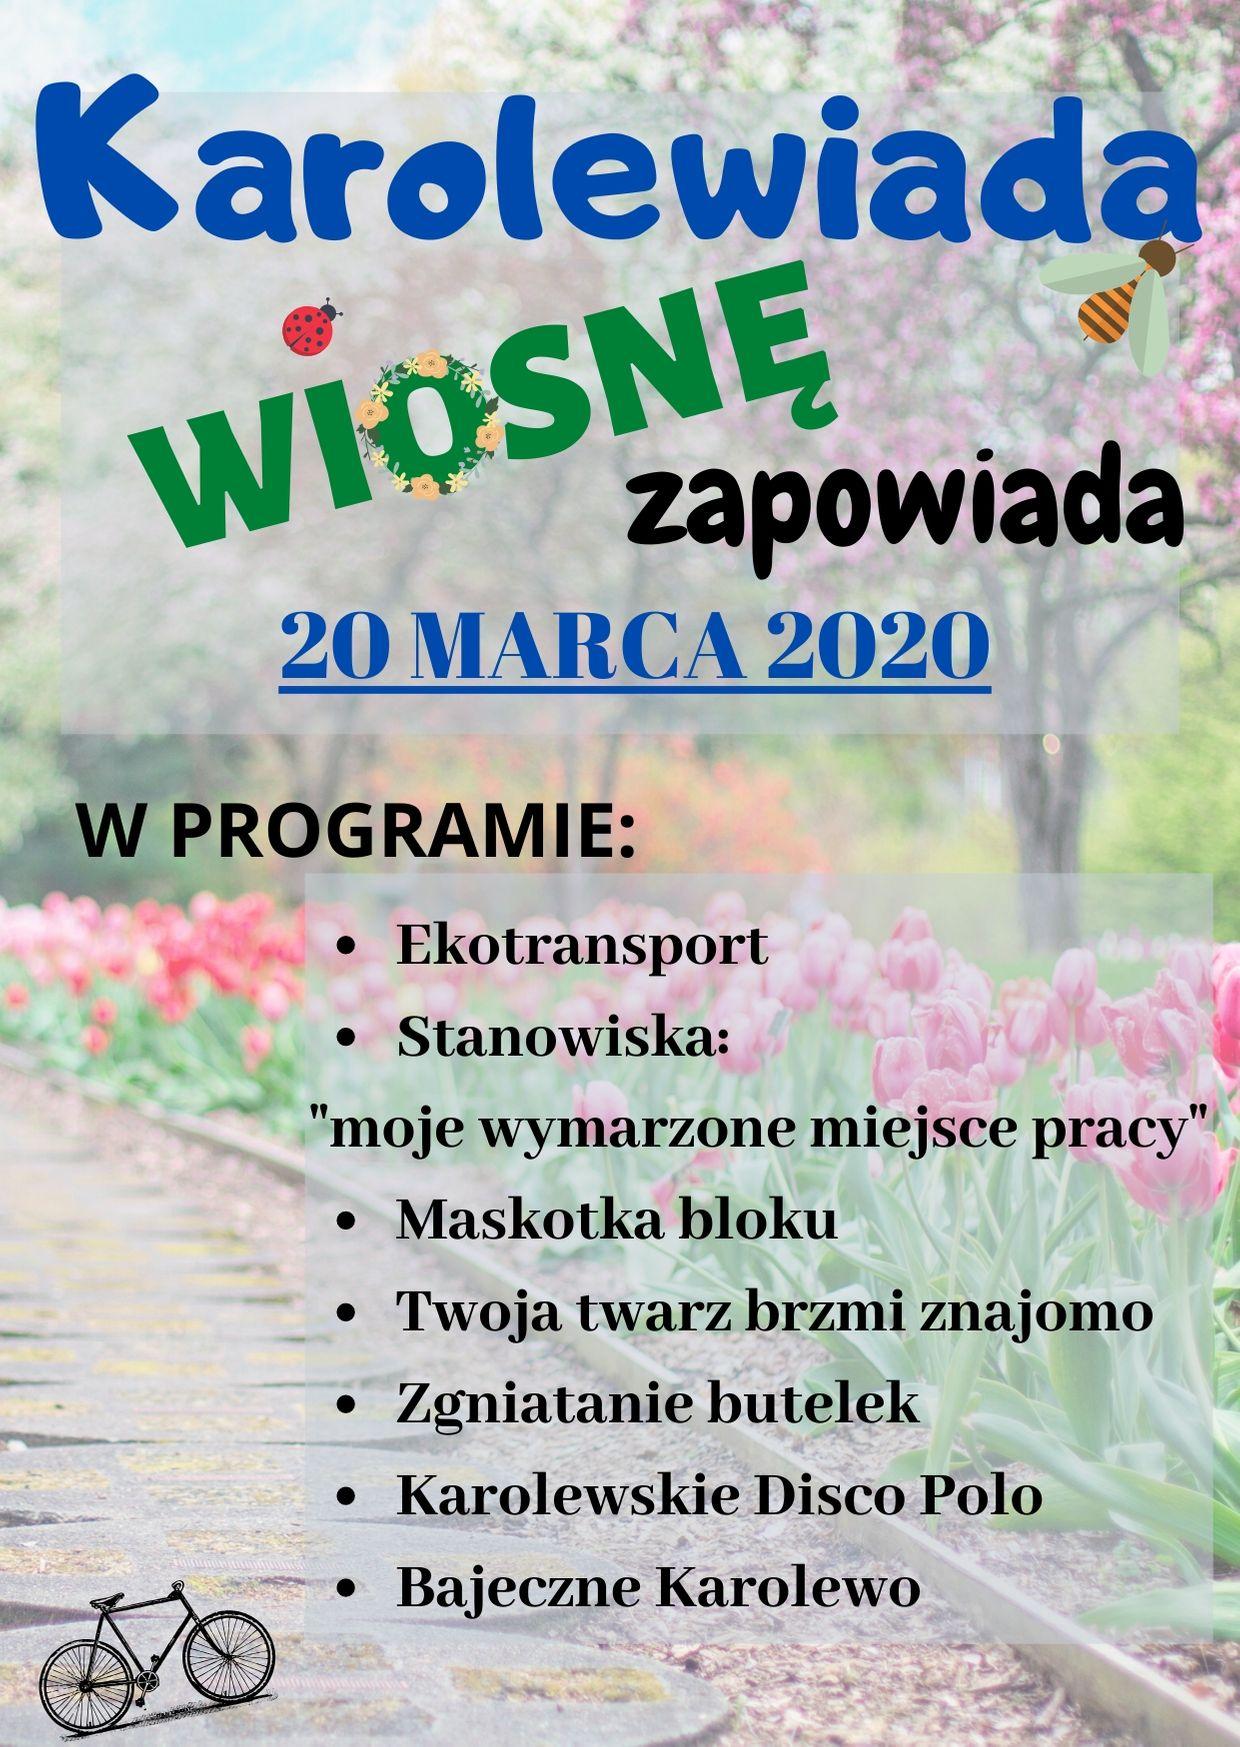 plakat-karolewiada-2020.jpg